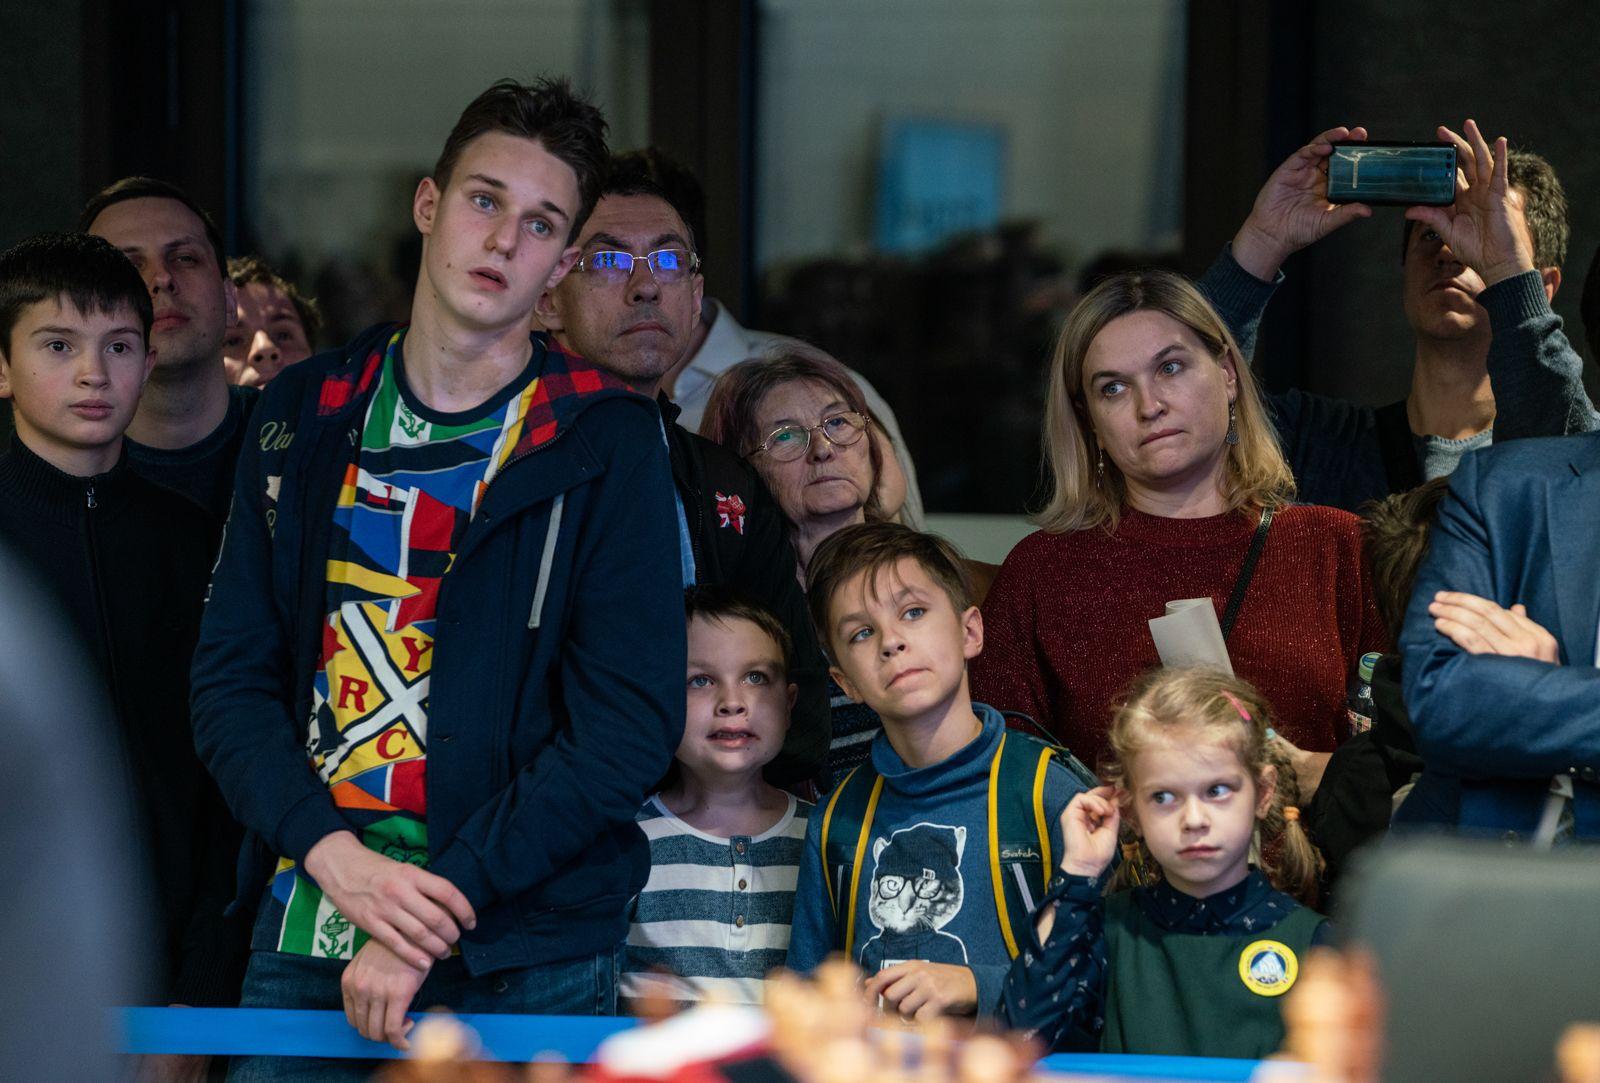 Spectators 2021 World Rapid Chess Championship